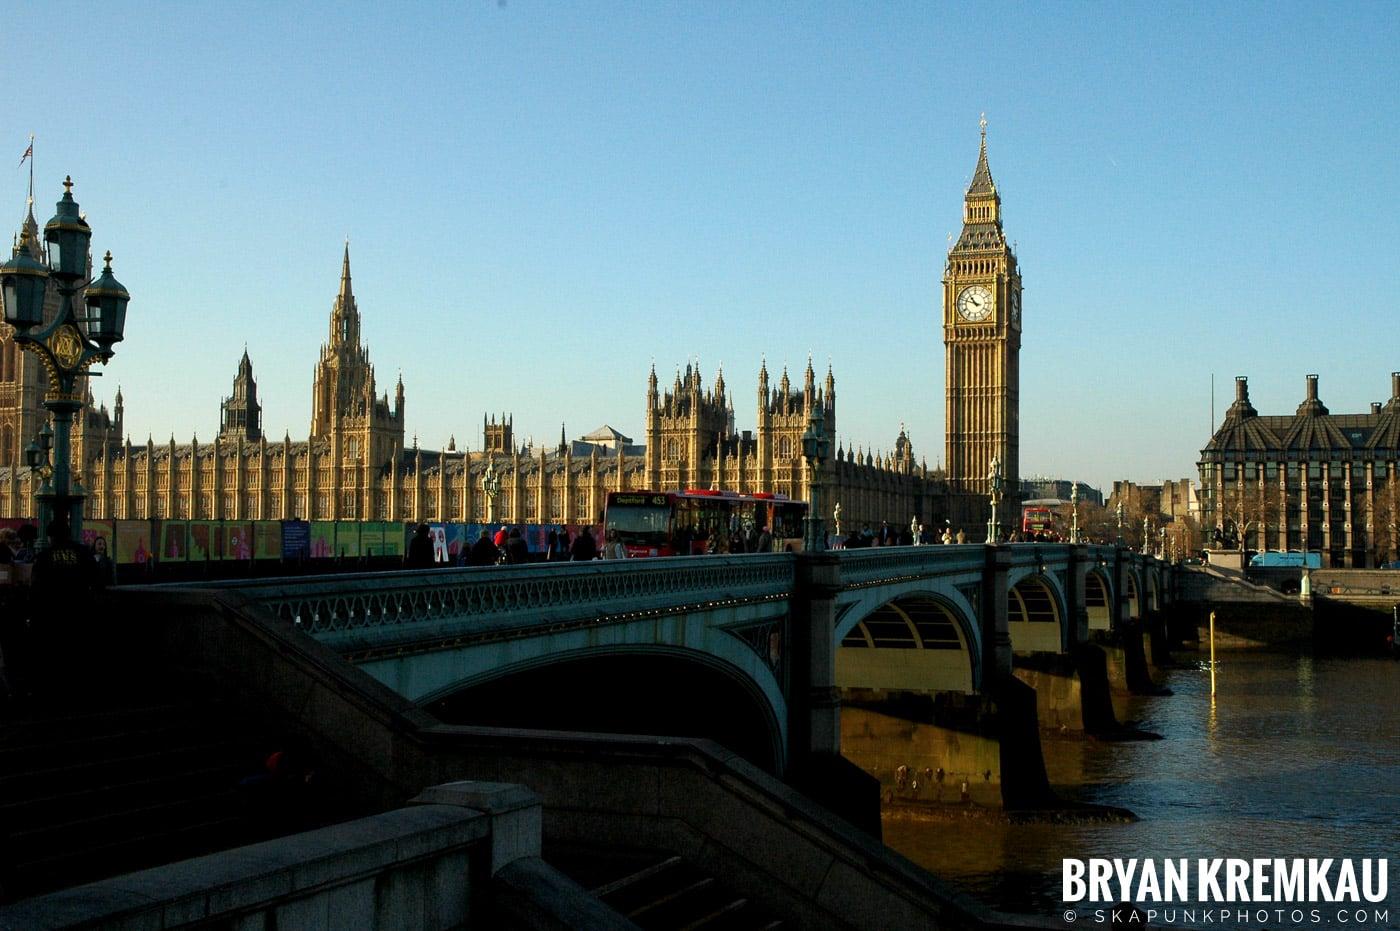 London, England - Day 4 - 12.19.05 (40)